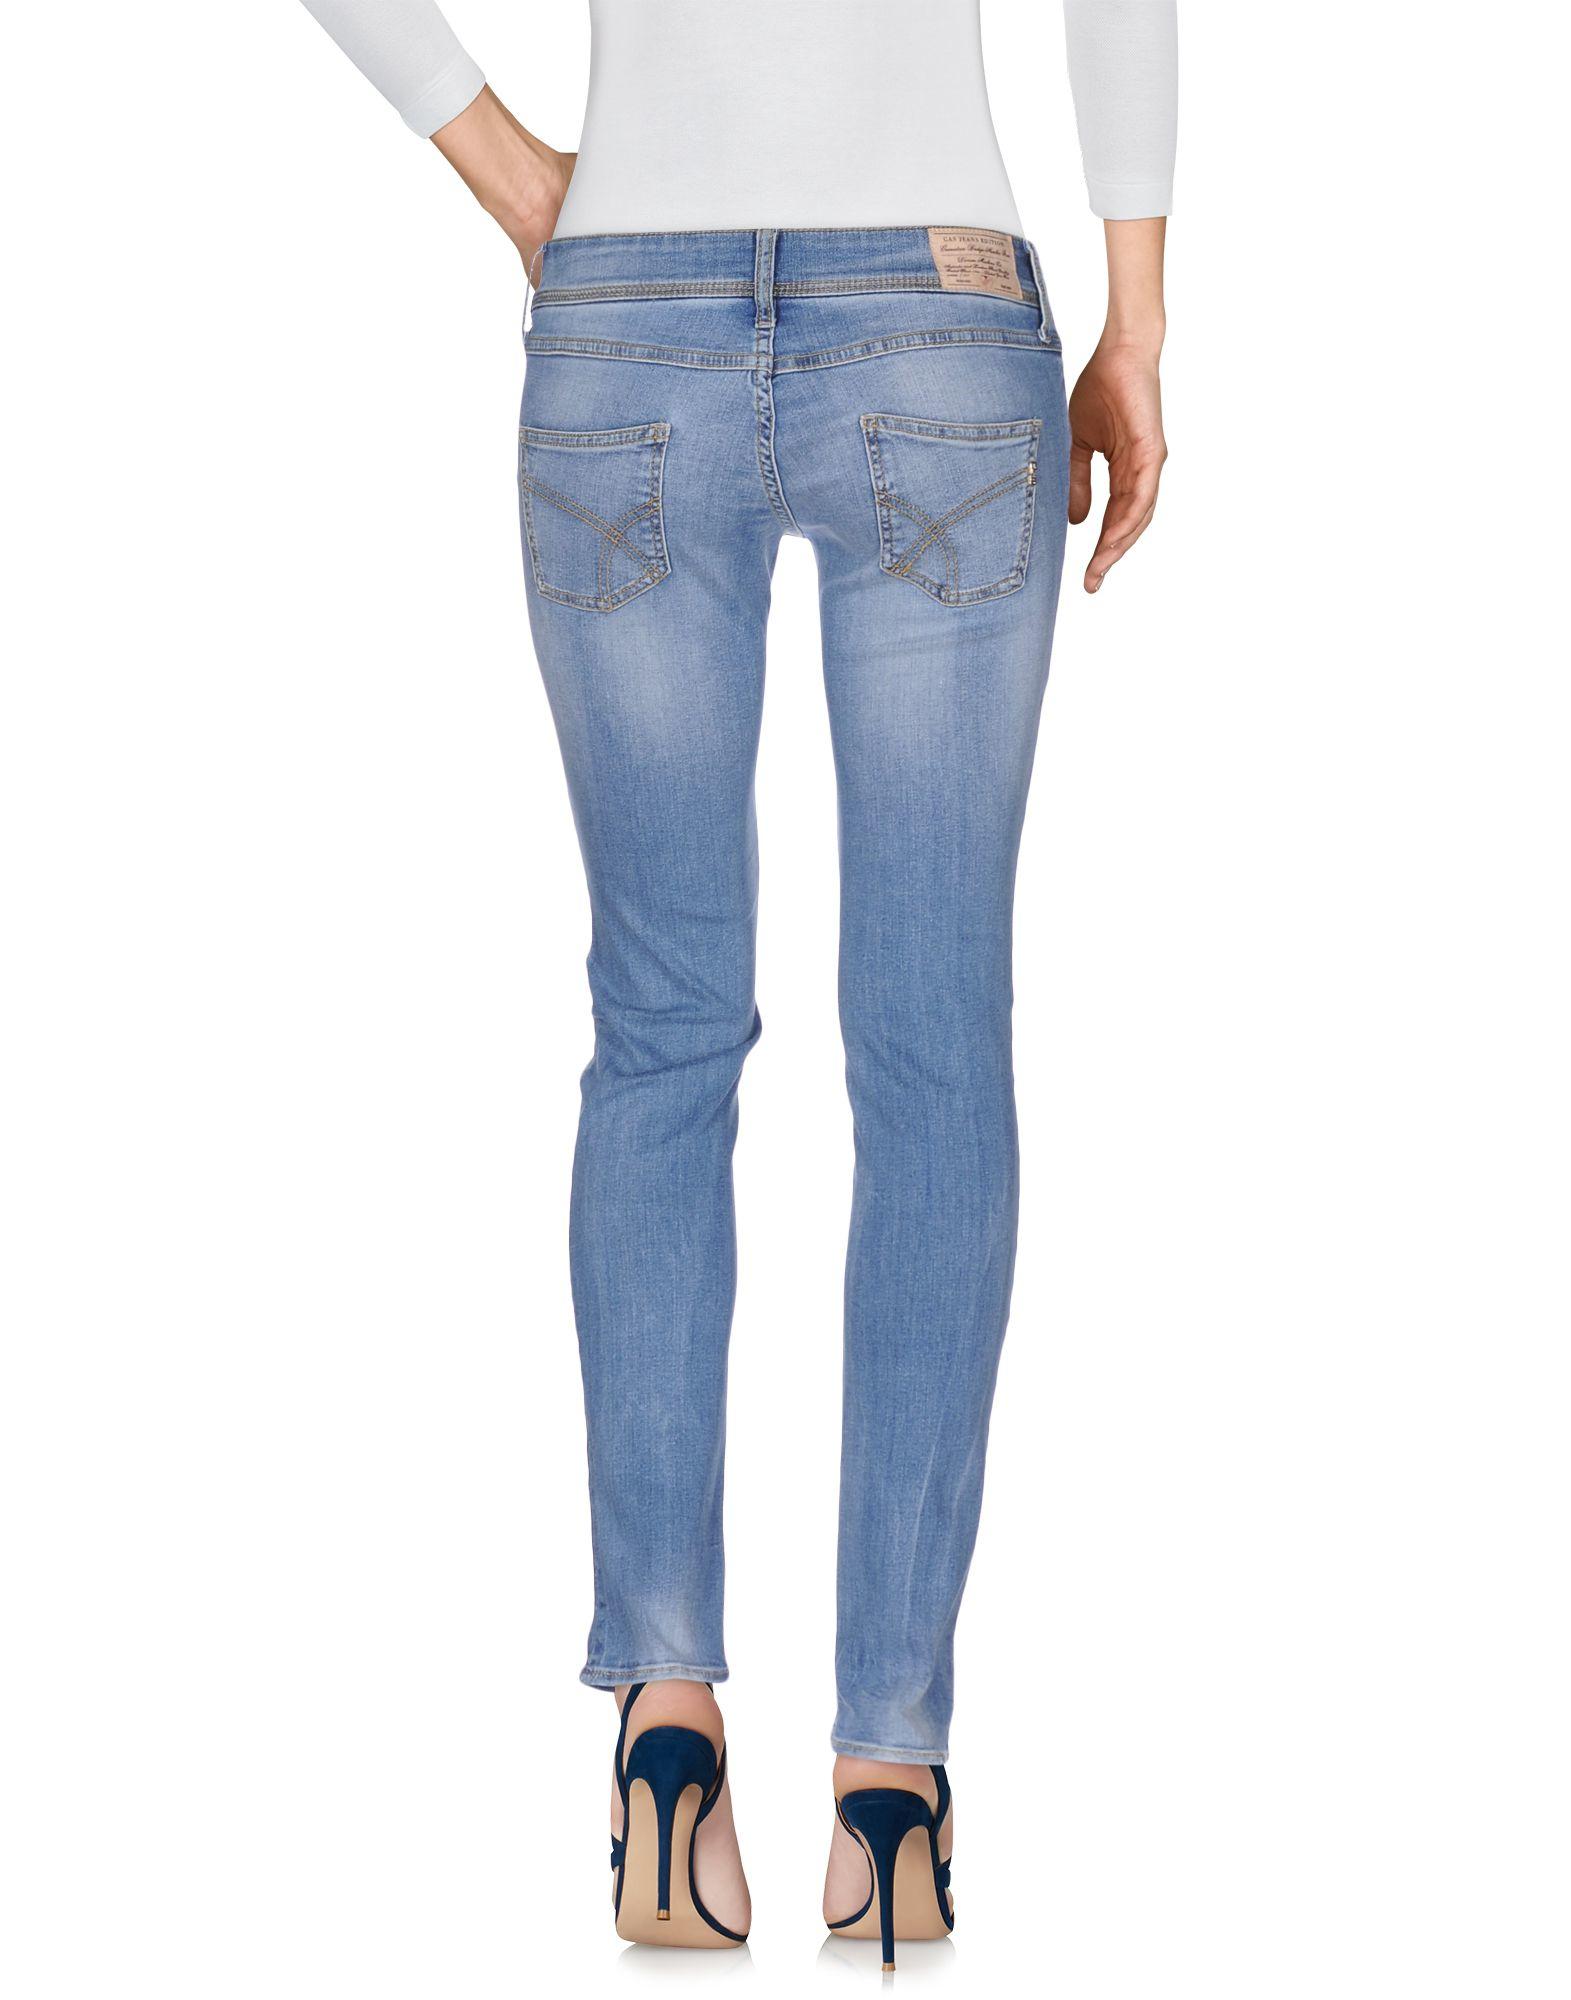 Lyst - Gas Denim Pants in Blue